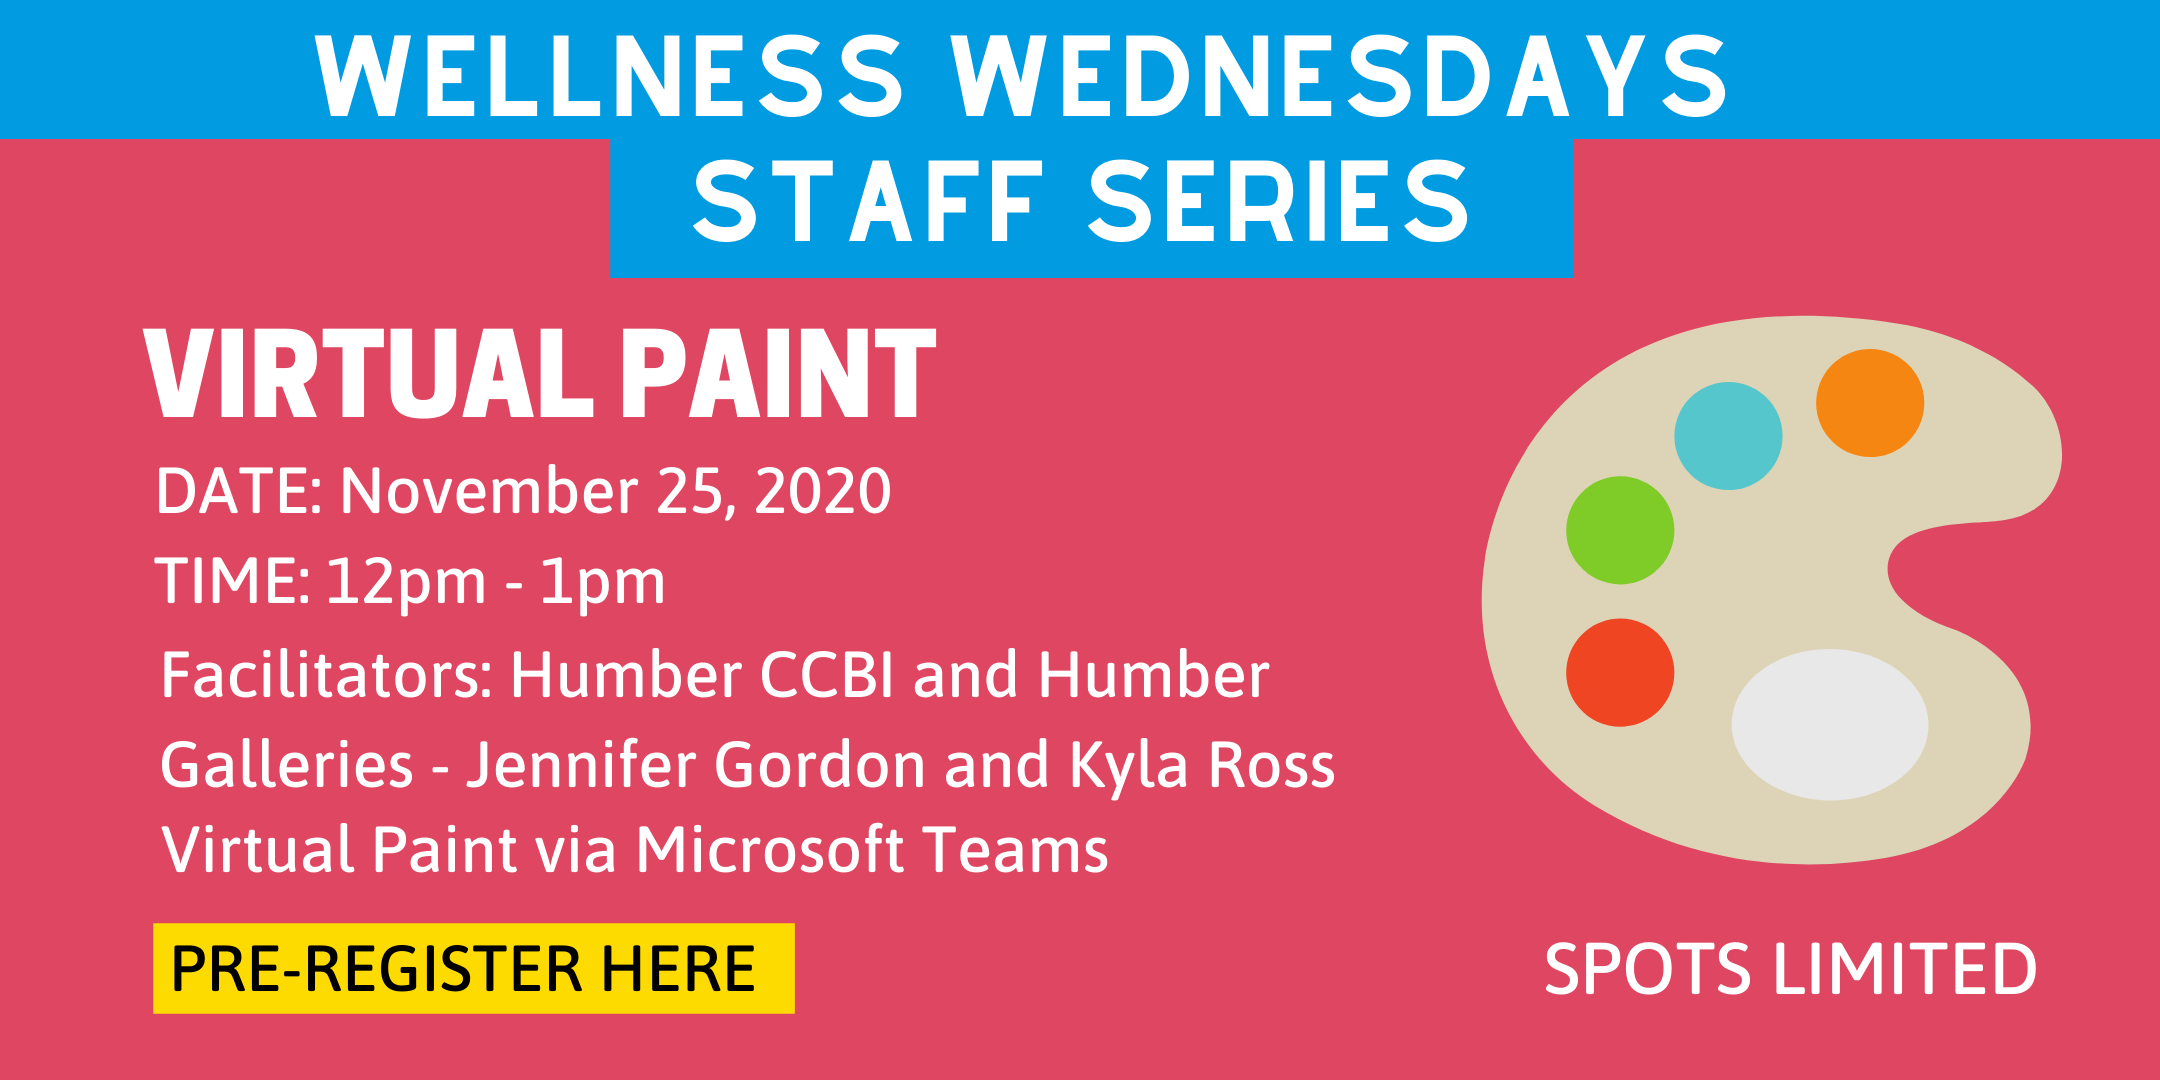 Event Details for the Principal's Wellness Wednesdays - Virtual Paint